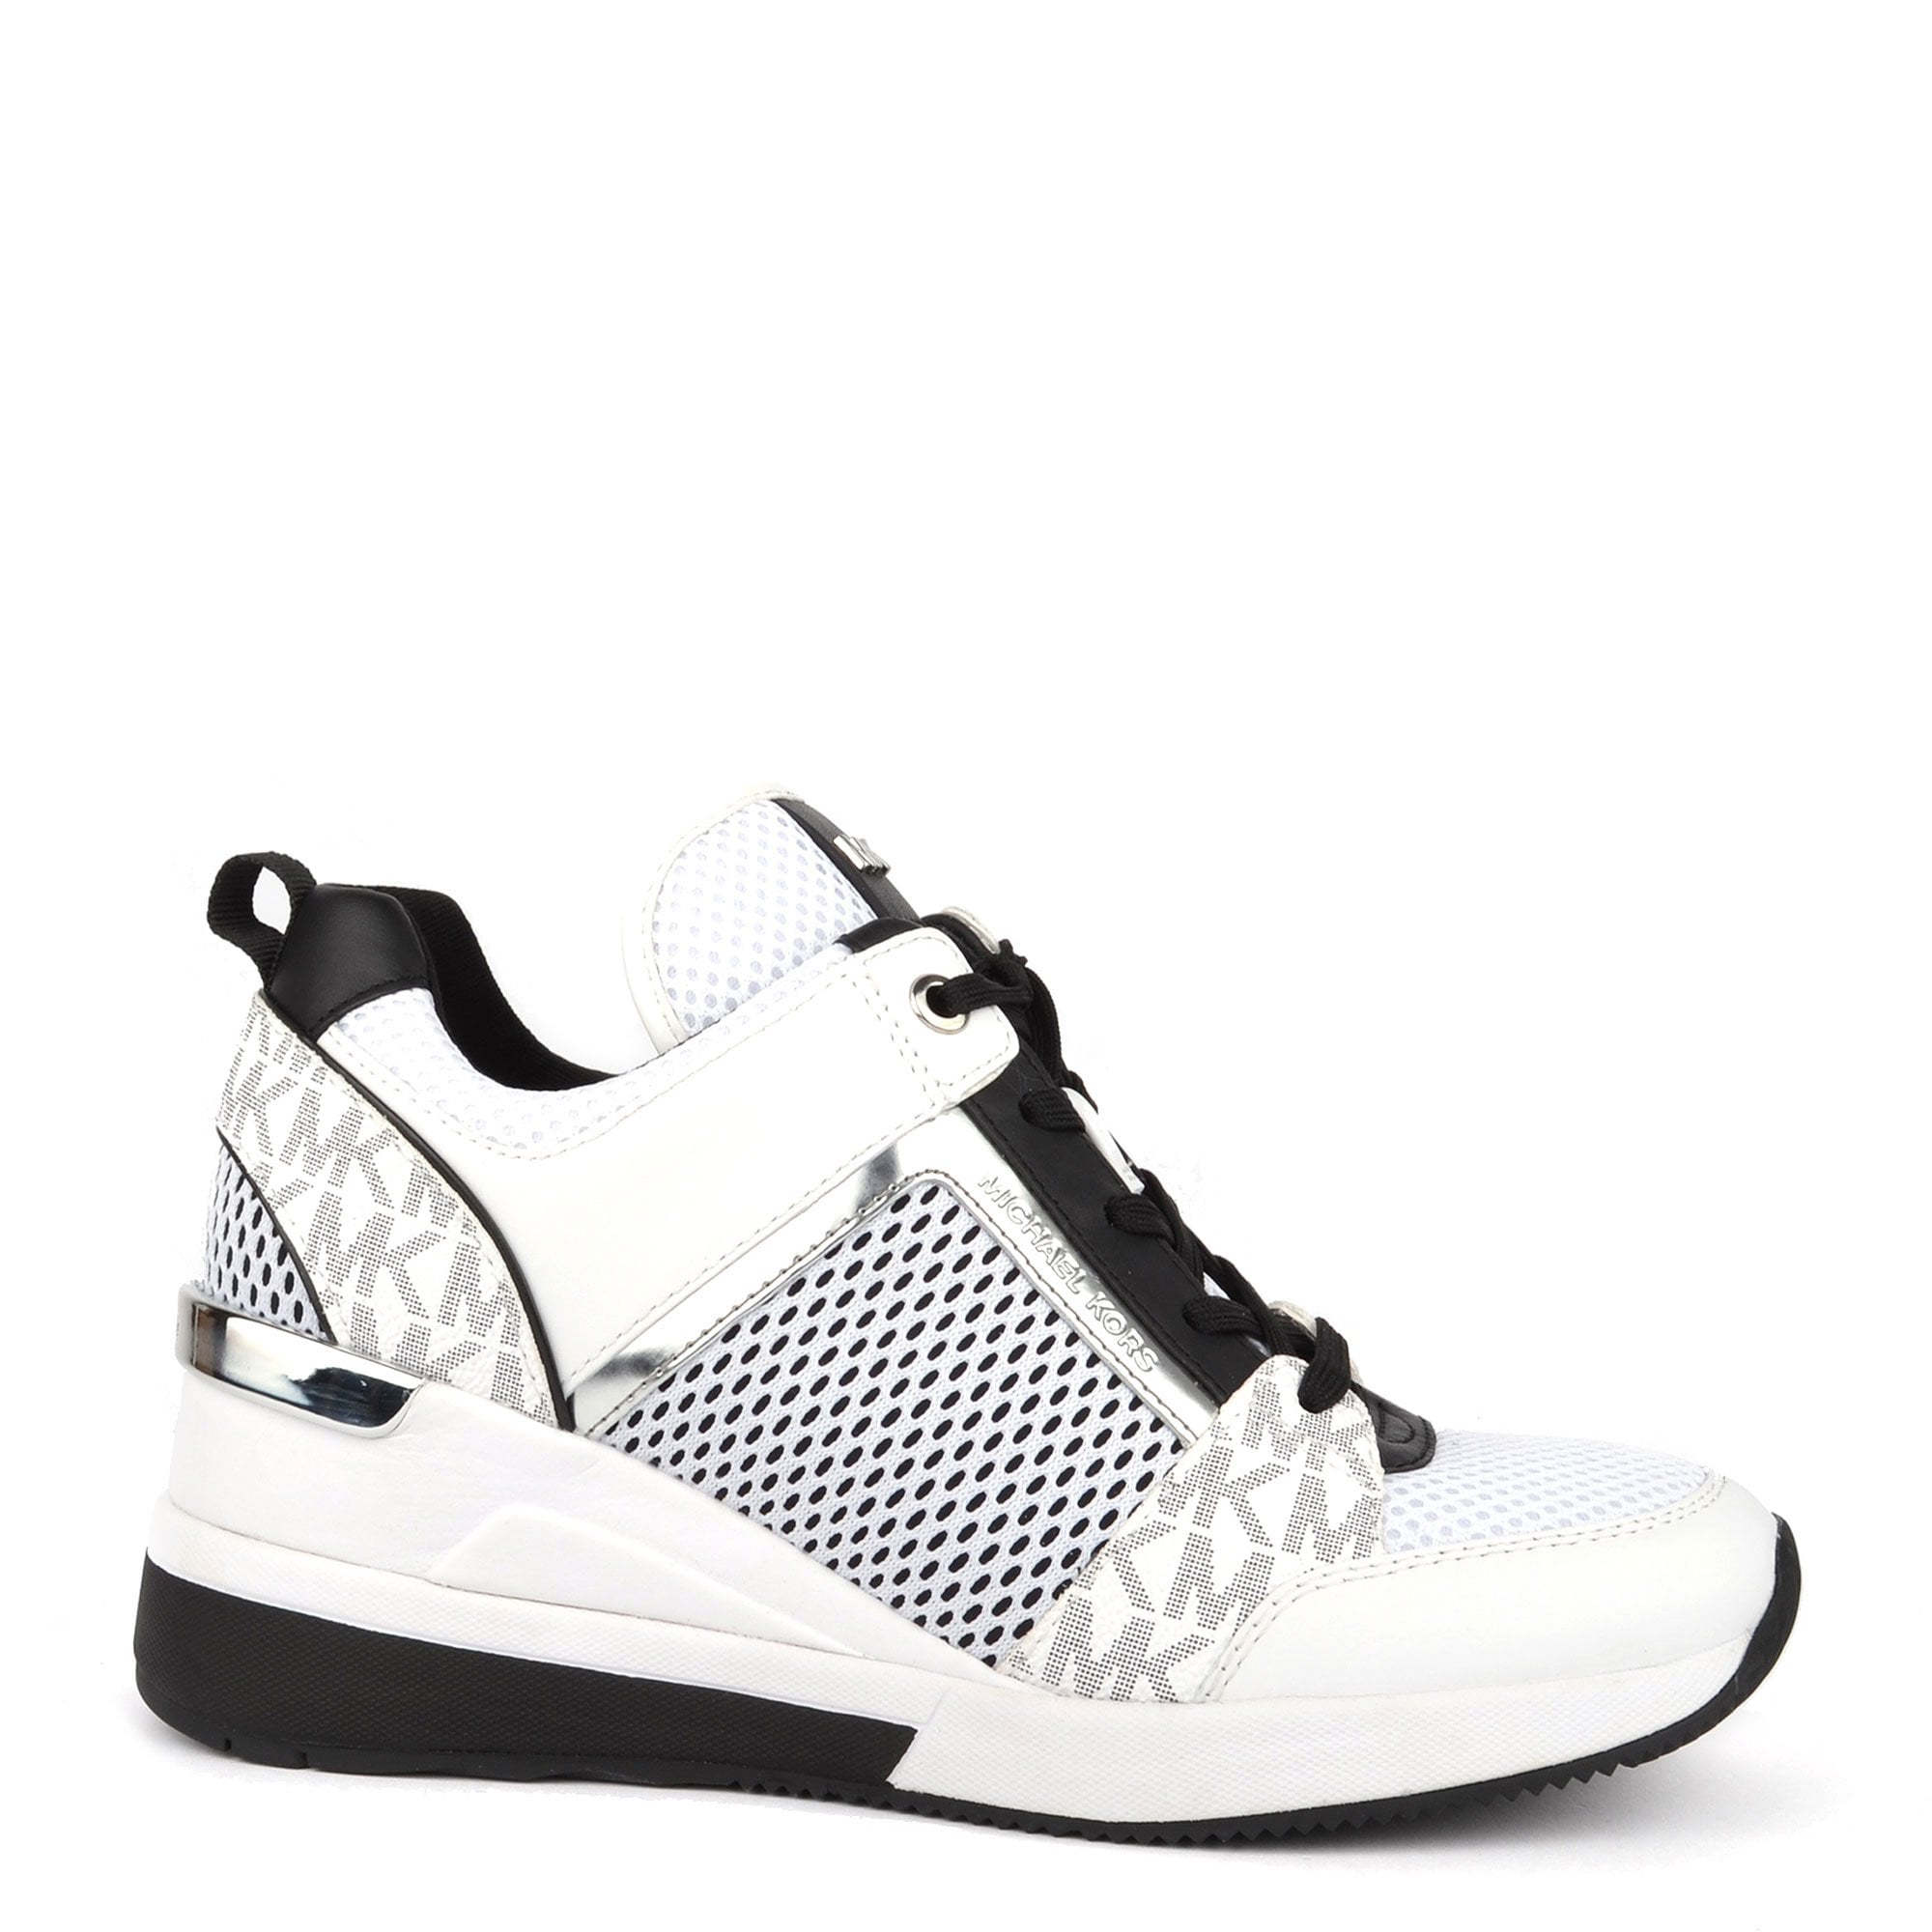 michael kors white trainers